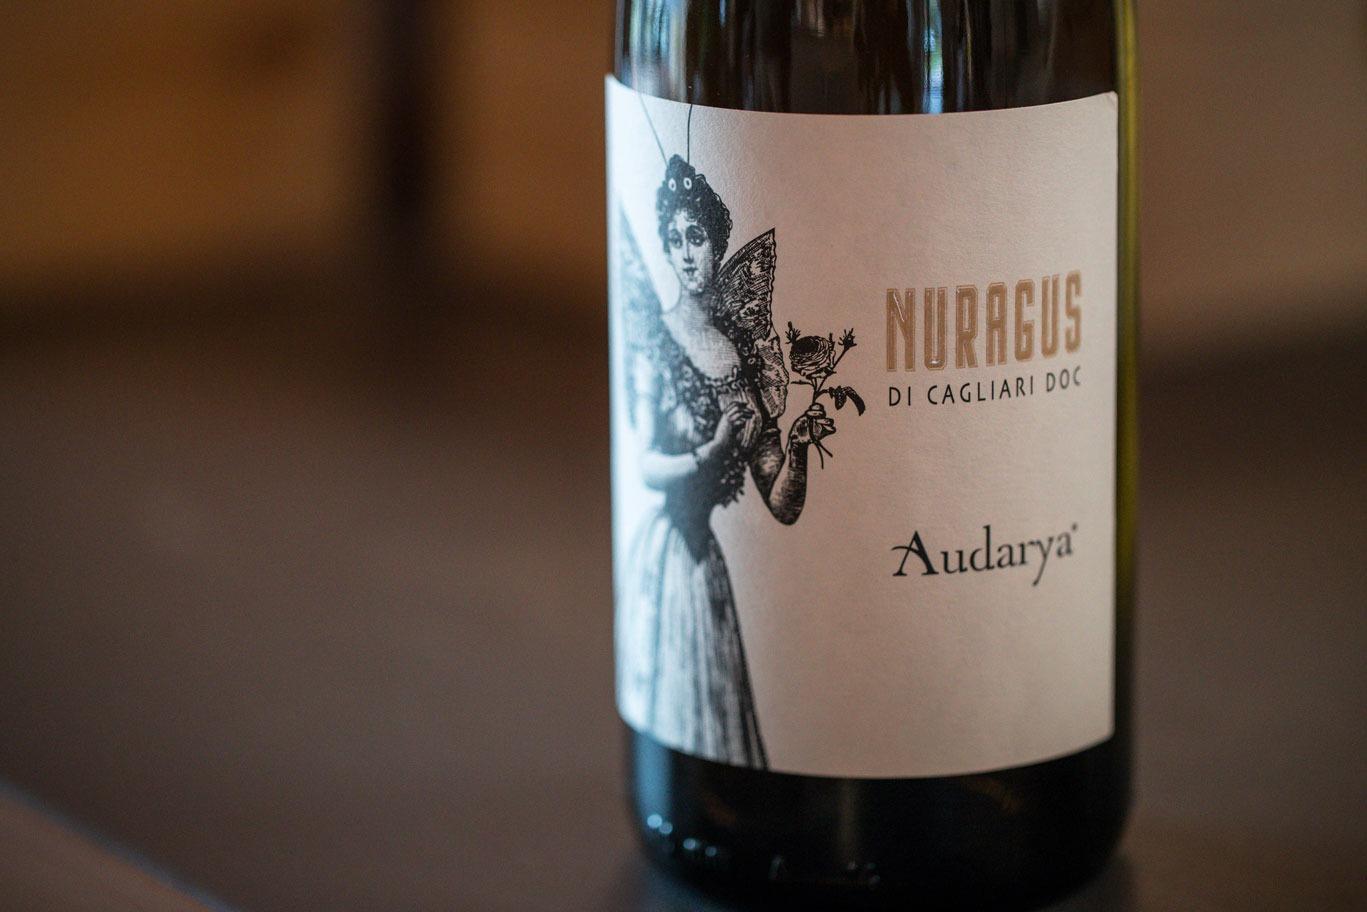 nuragus di Cagliari doc Audarya vino bianco autoctono